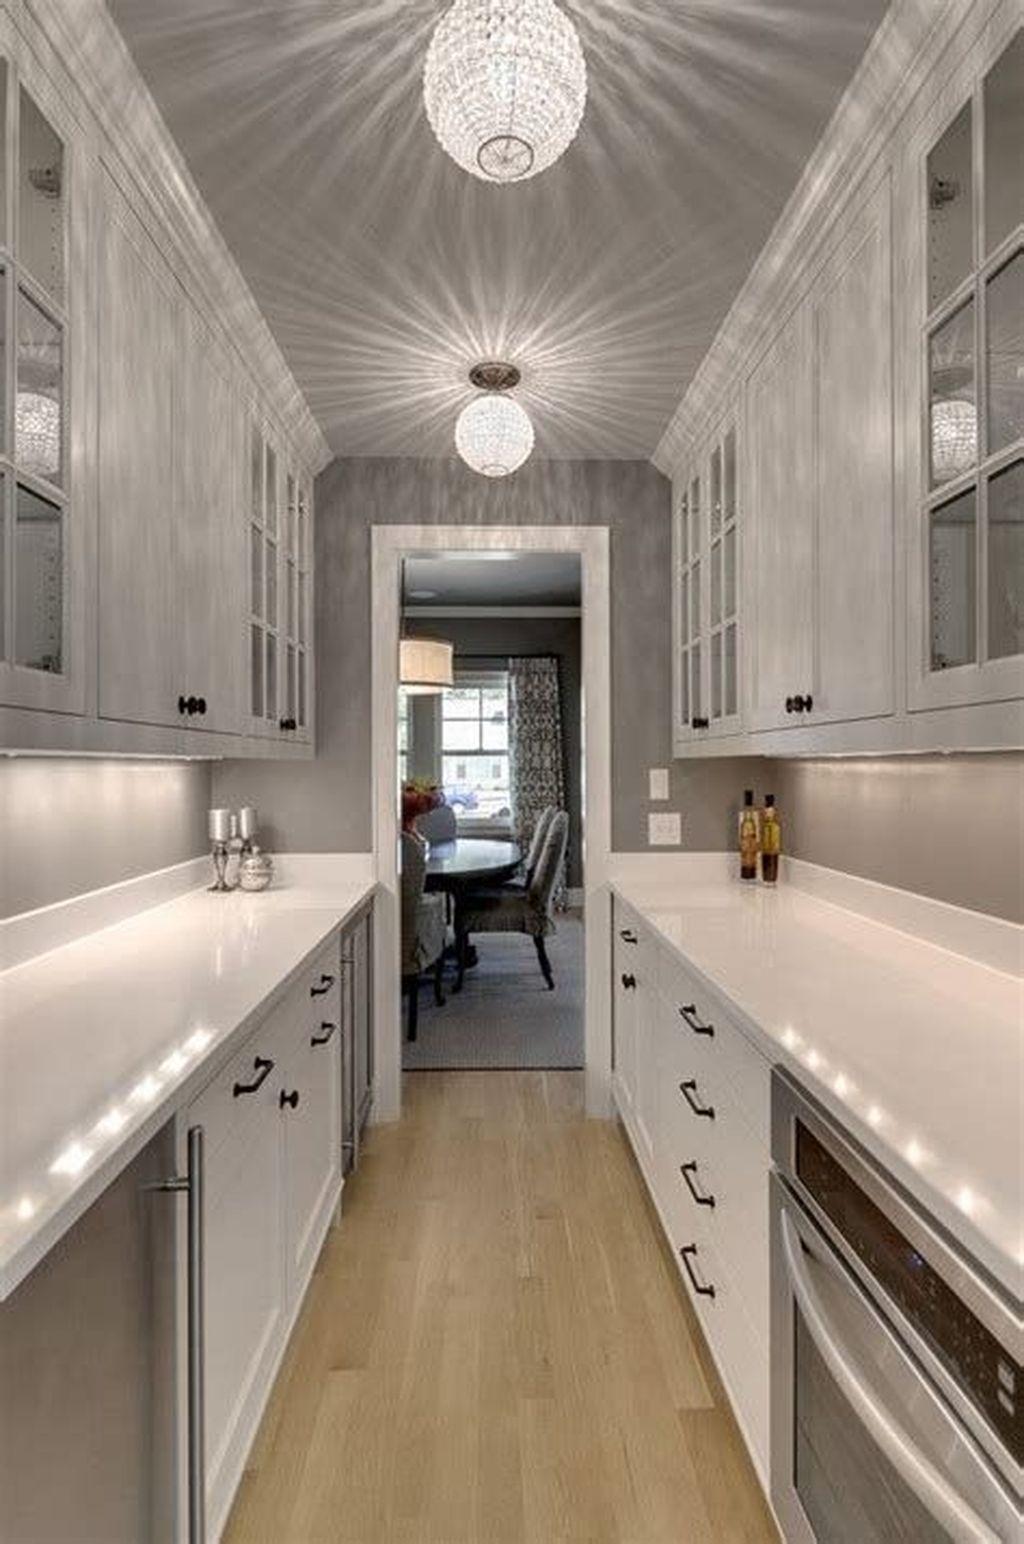 Brilliant Small Kitchen Remodel Design Ideas On A Budget 12